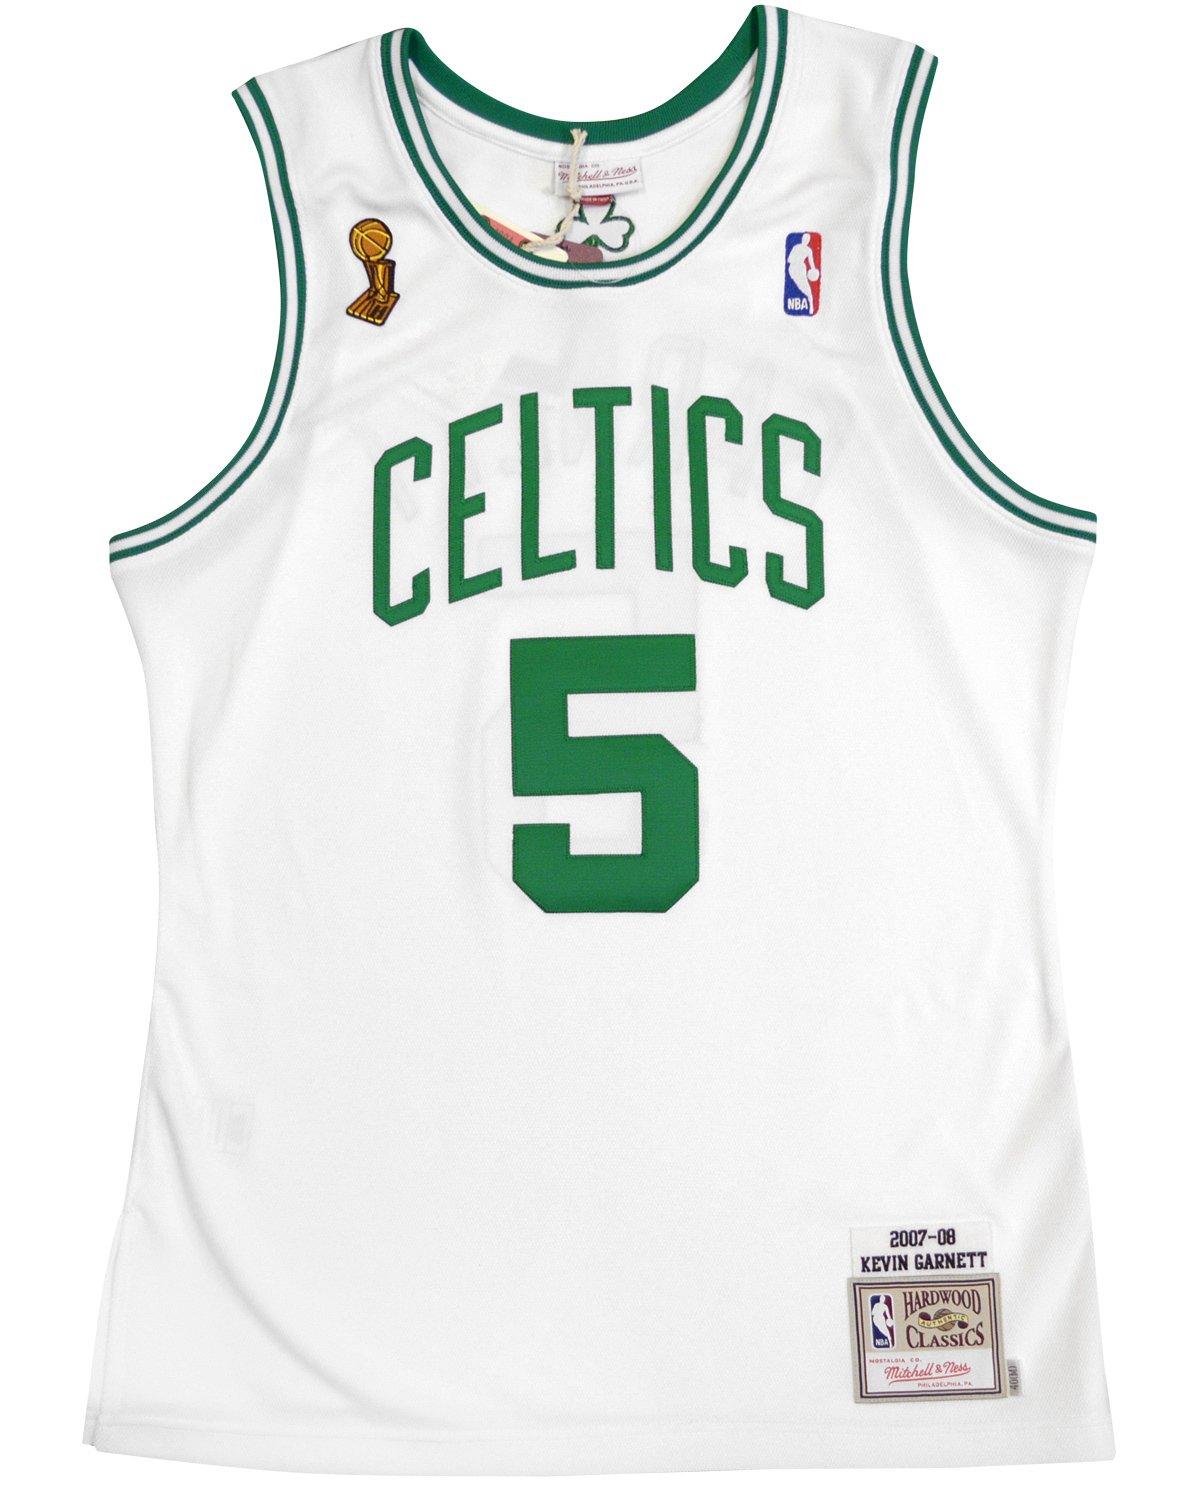 Mitchell ness kevin garnett boston celtics authentic finals jersey white  sports outdoors jpg 1200x1496 Celtics nba dac488848